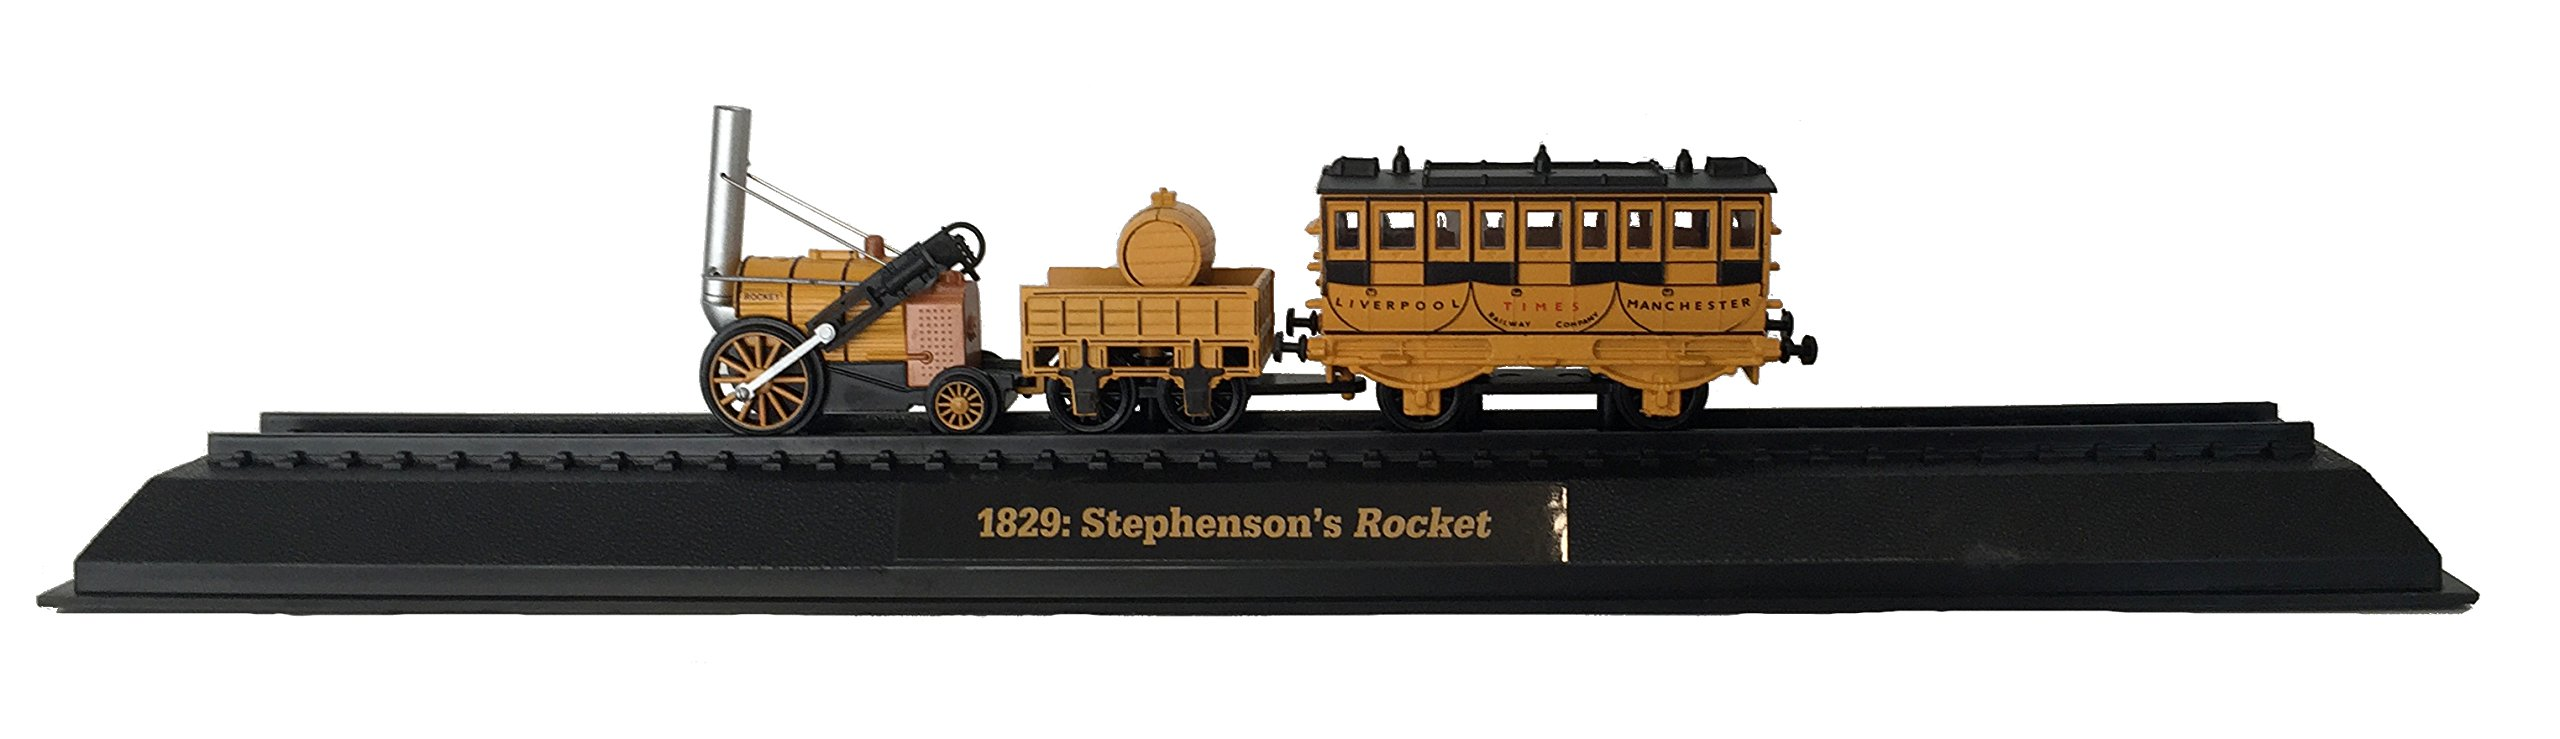 Stephenson's Rocket - 1829 Diecast 1:76 Scale Locomotive Model (Amercom OO-27)